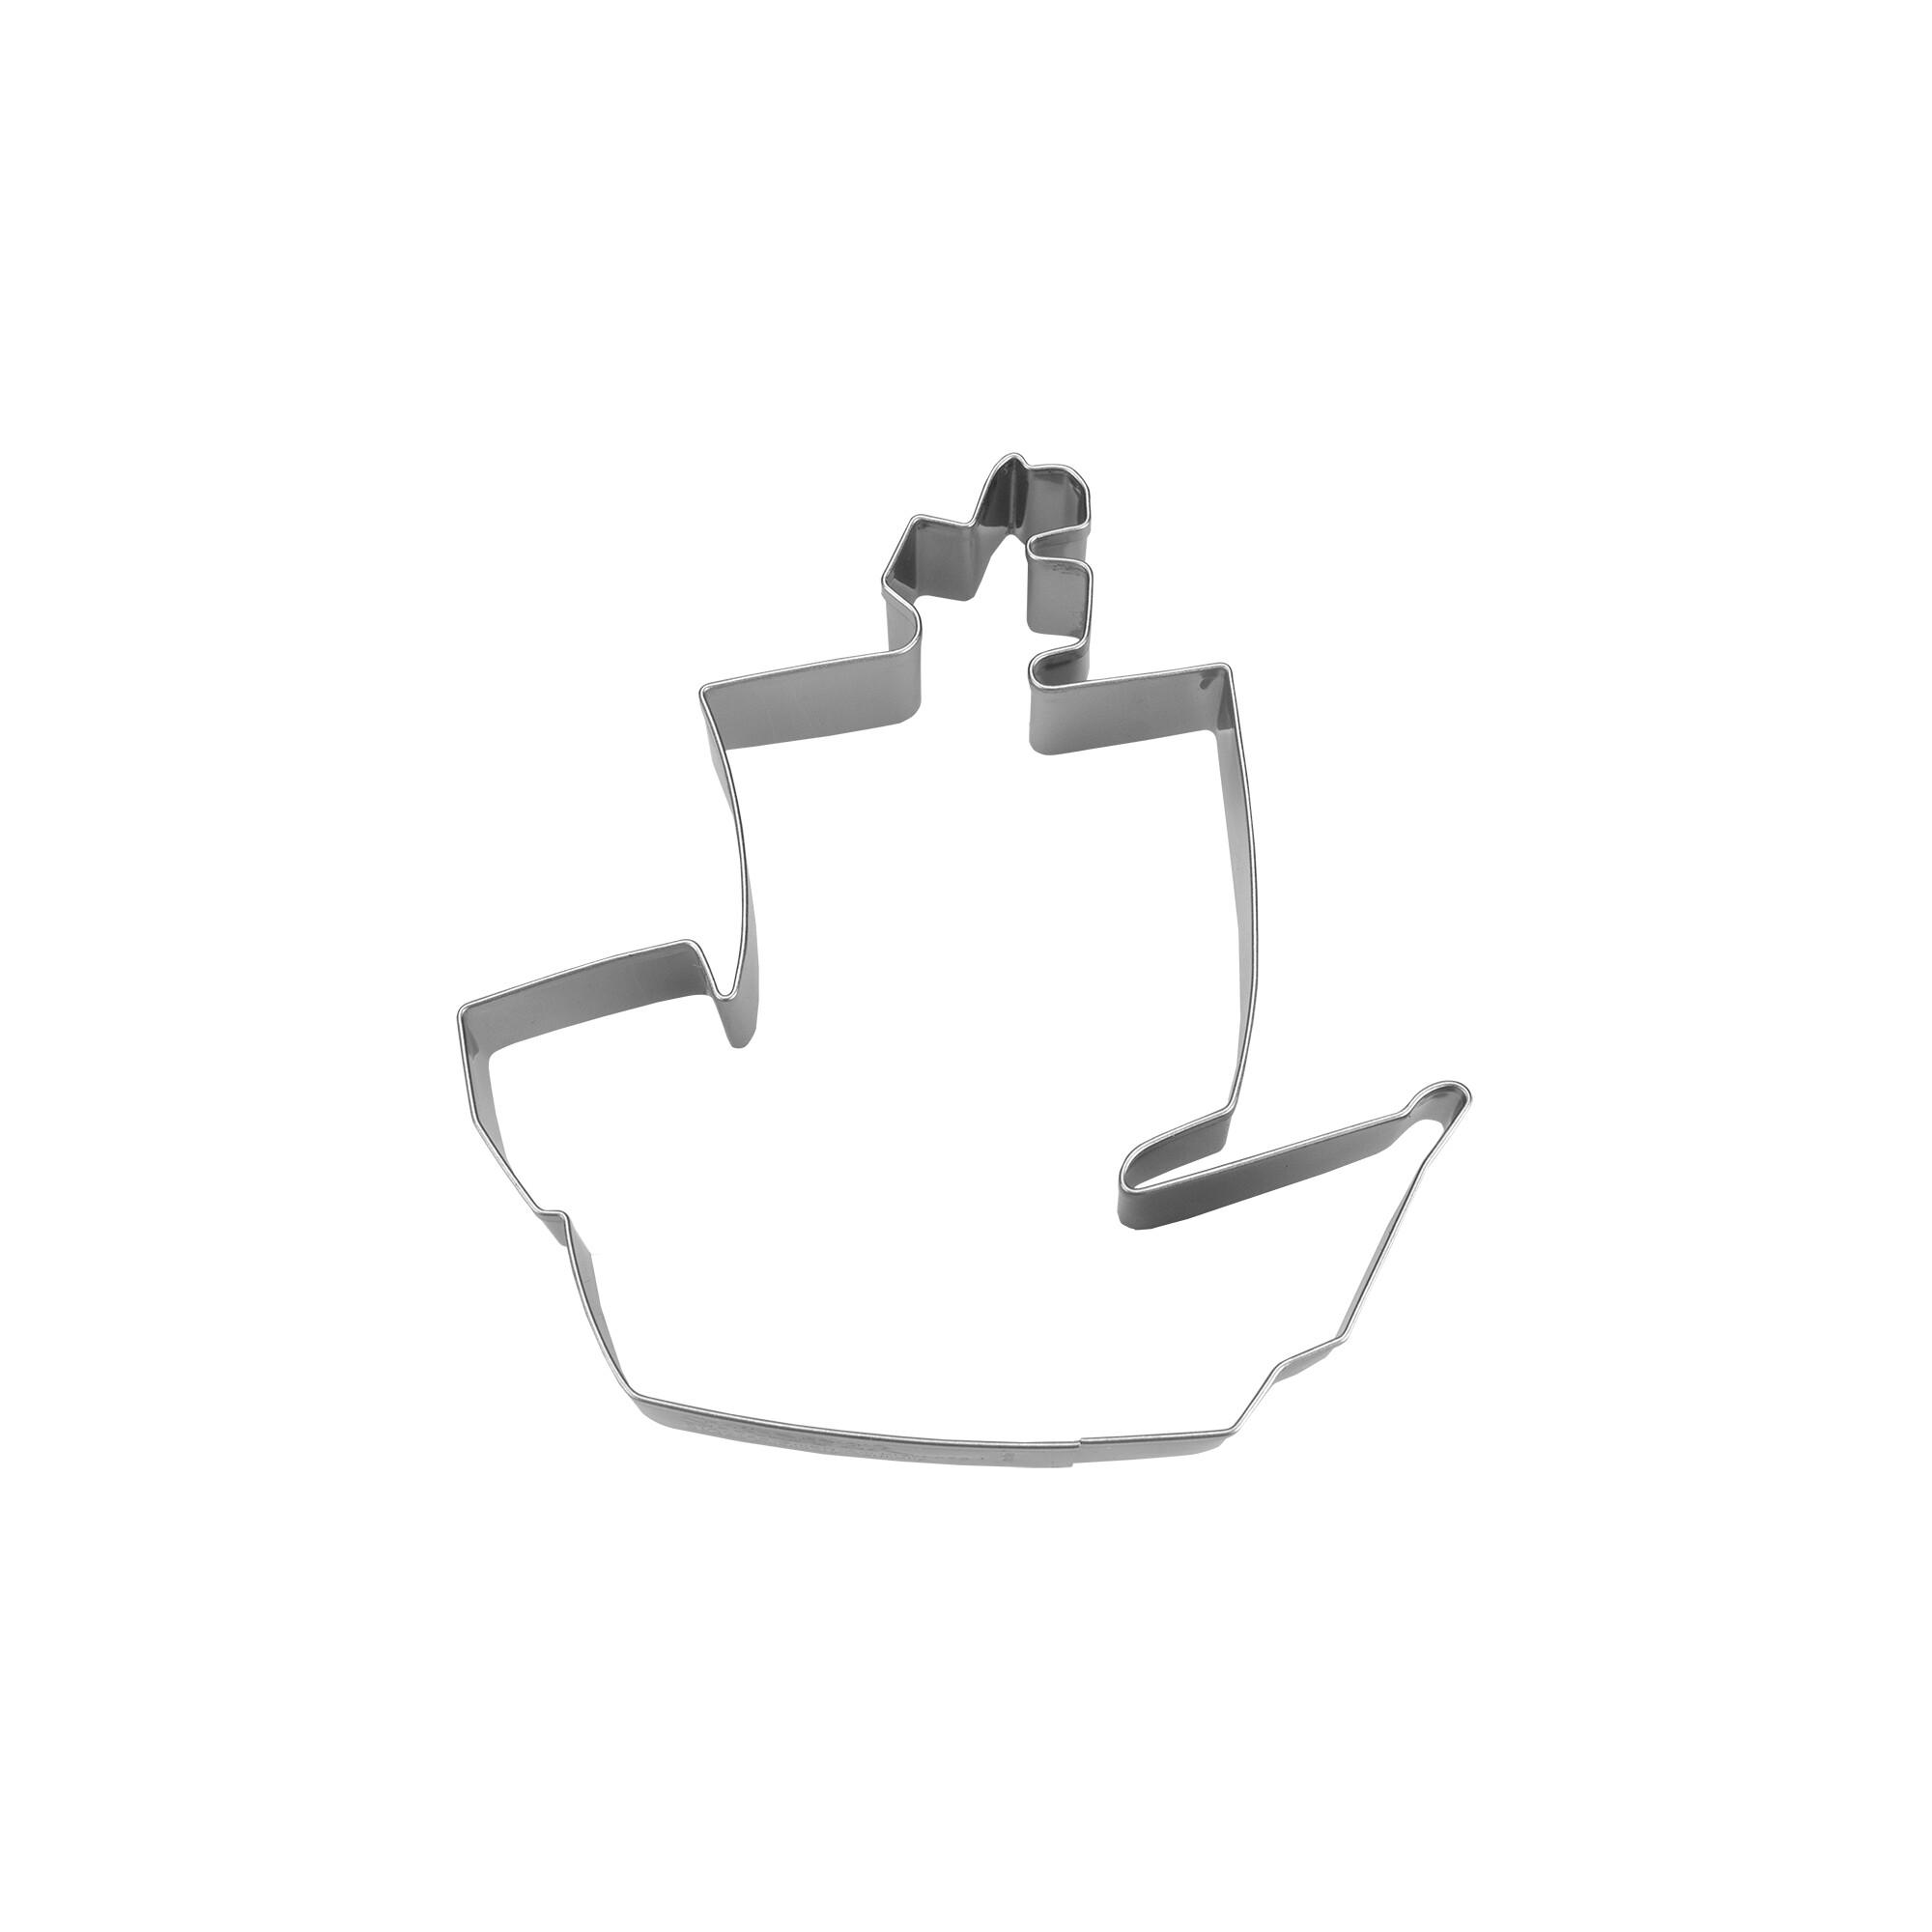 Ausstecher - Piratenschiff